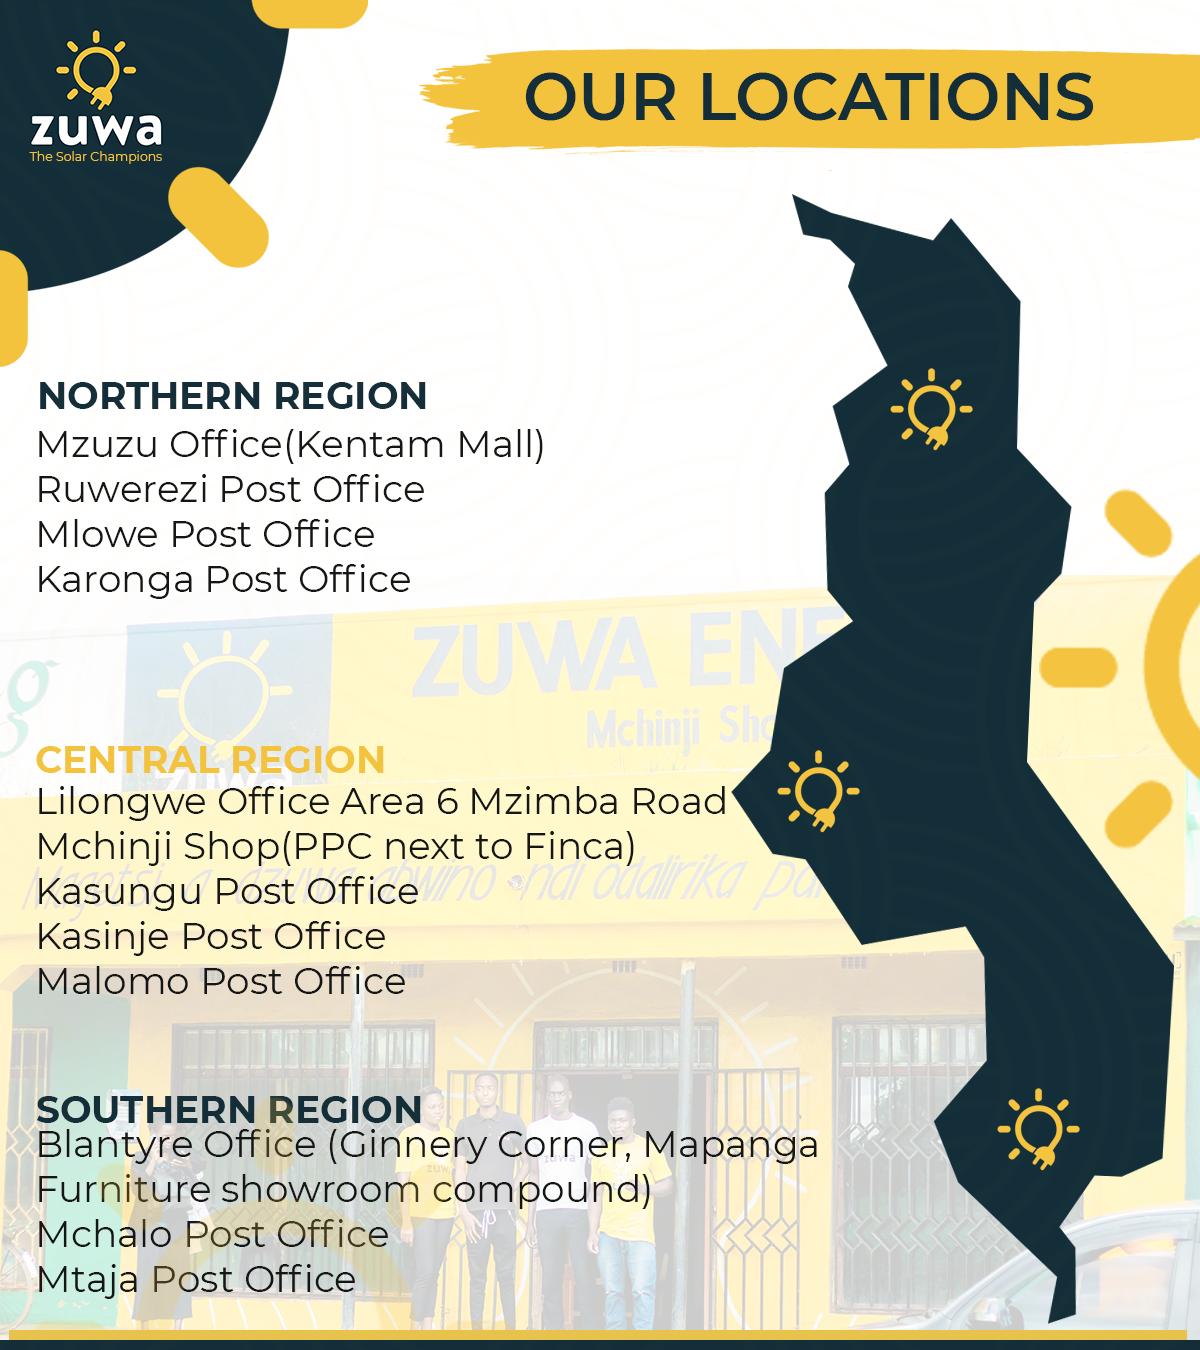 http://zuwaenergymw.com/wp-content/uploads/2021/08/IG-LOCATIONS-1200x1350.png